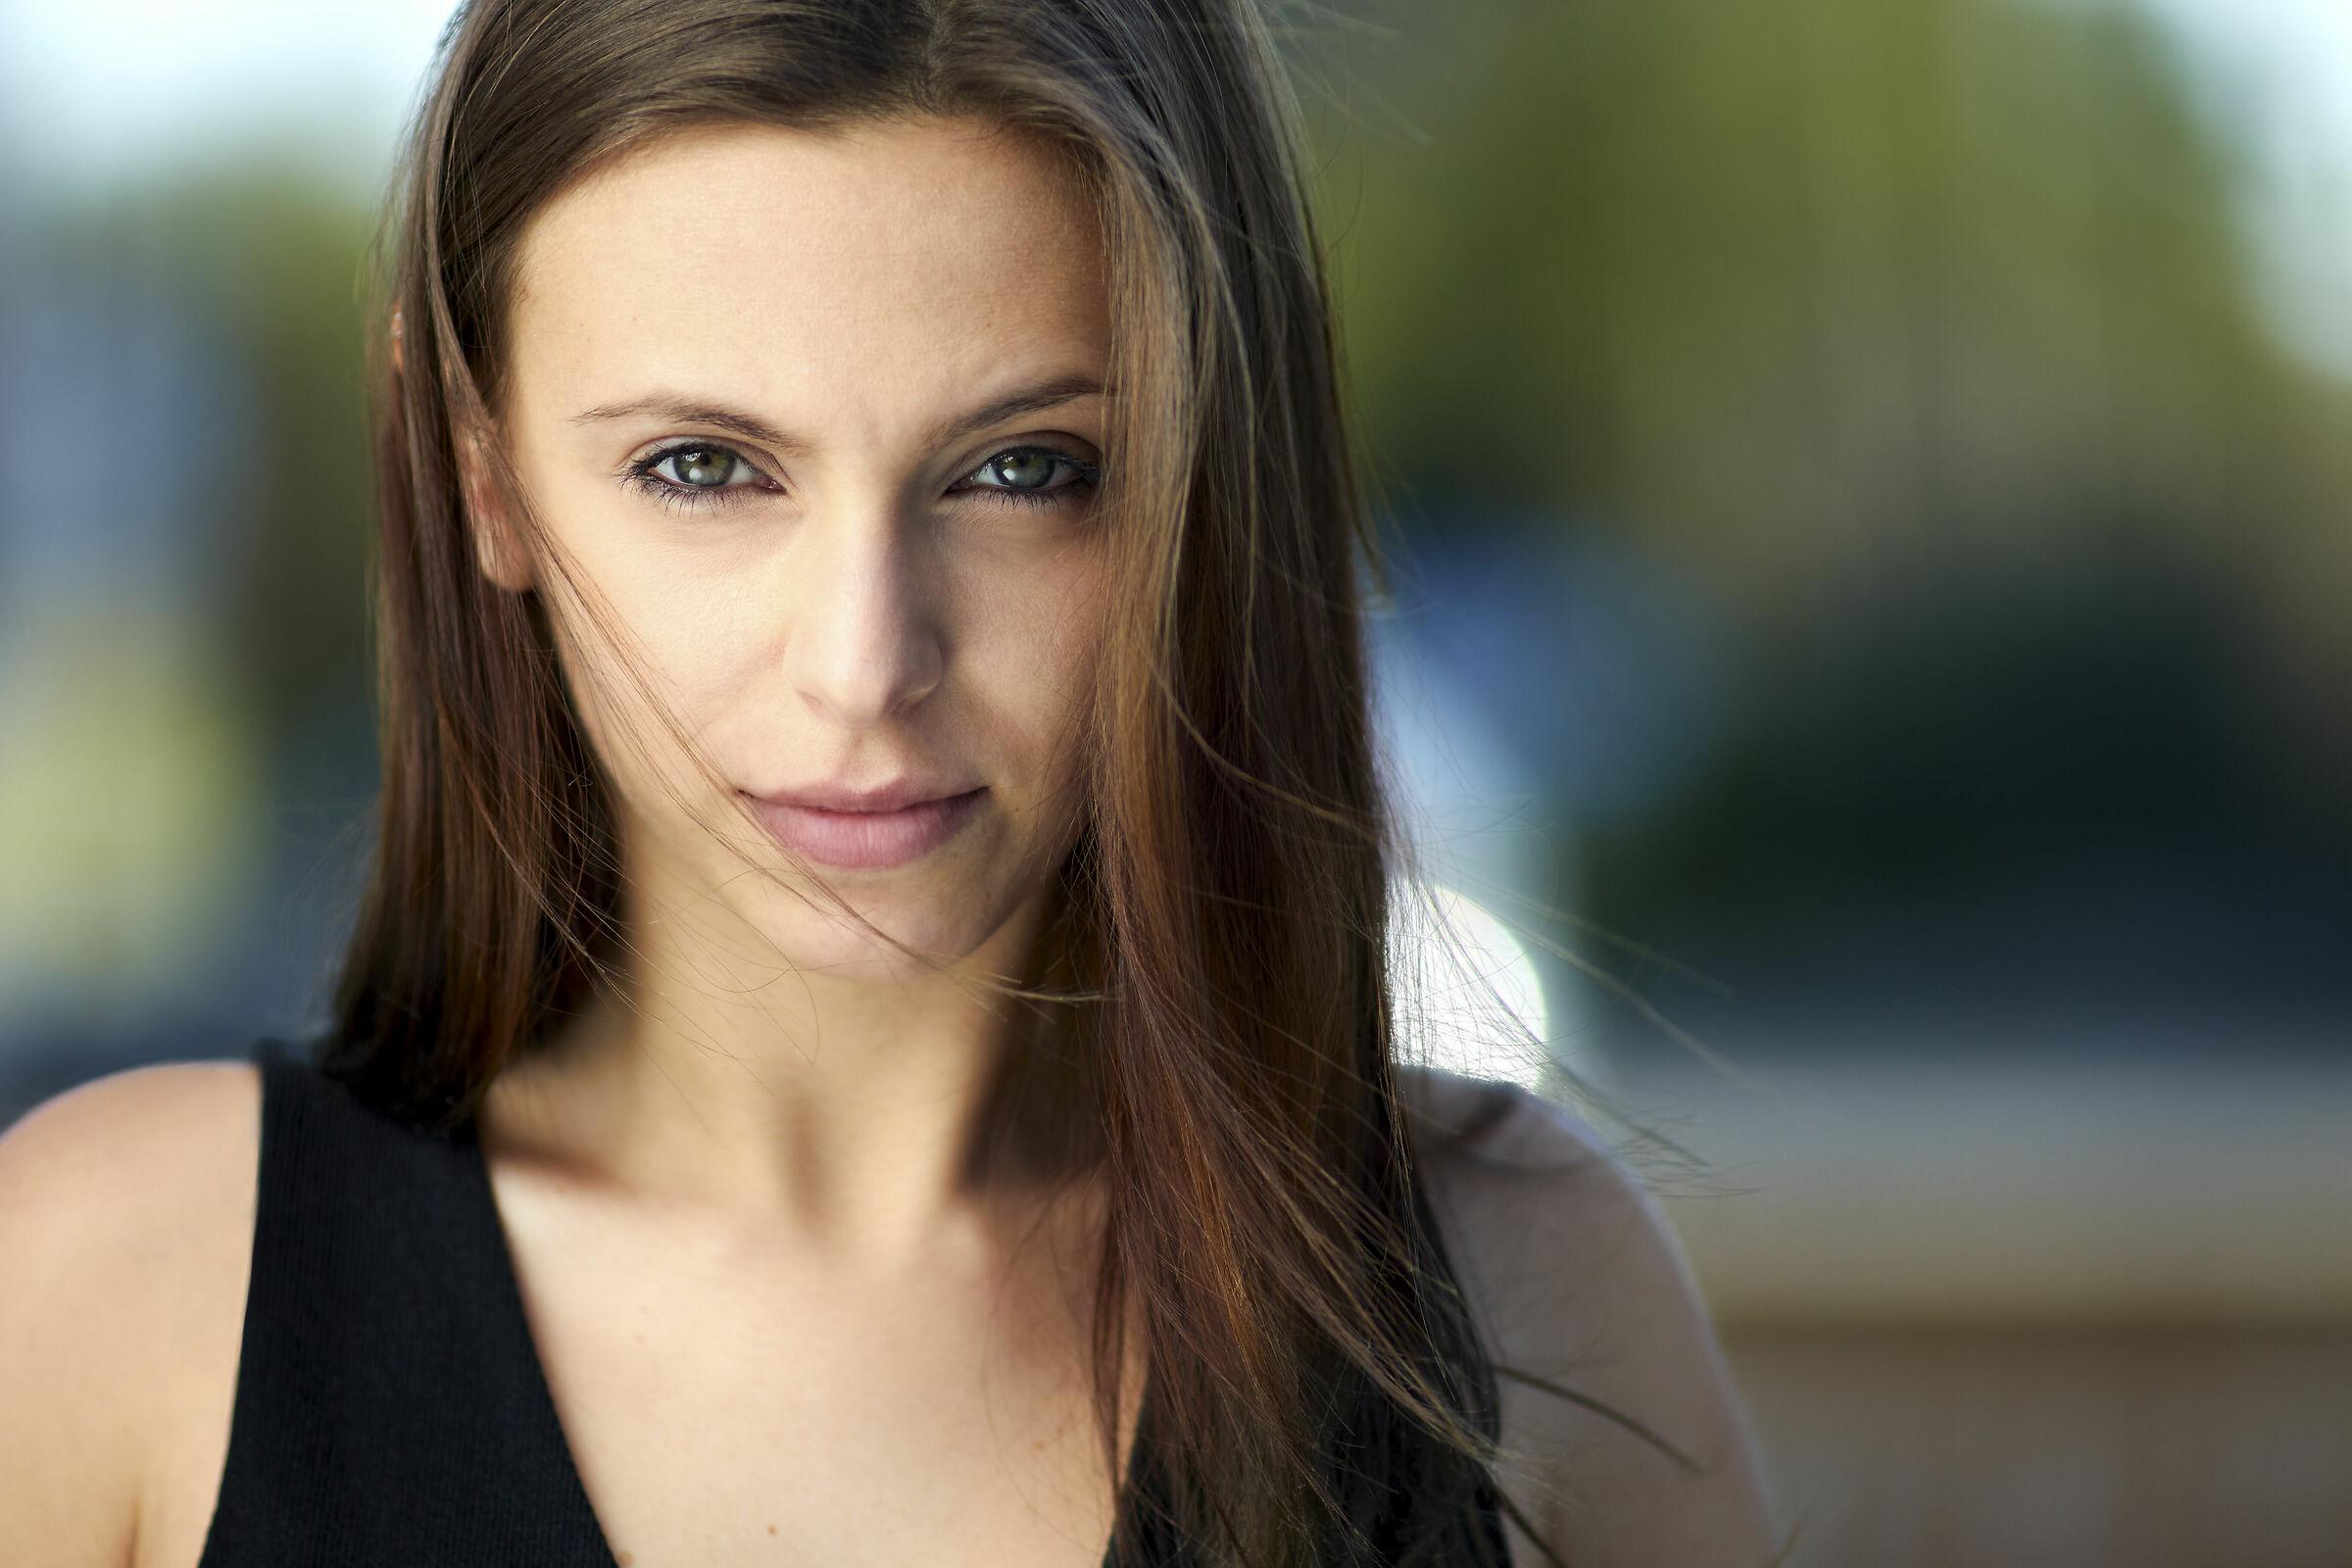 Maria Chiara 2 - Actress...